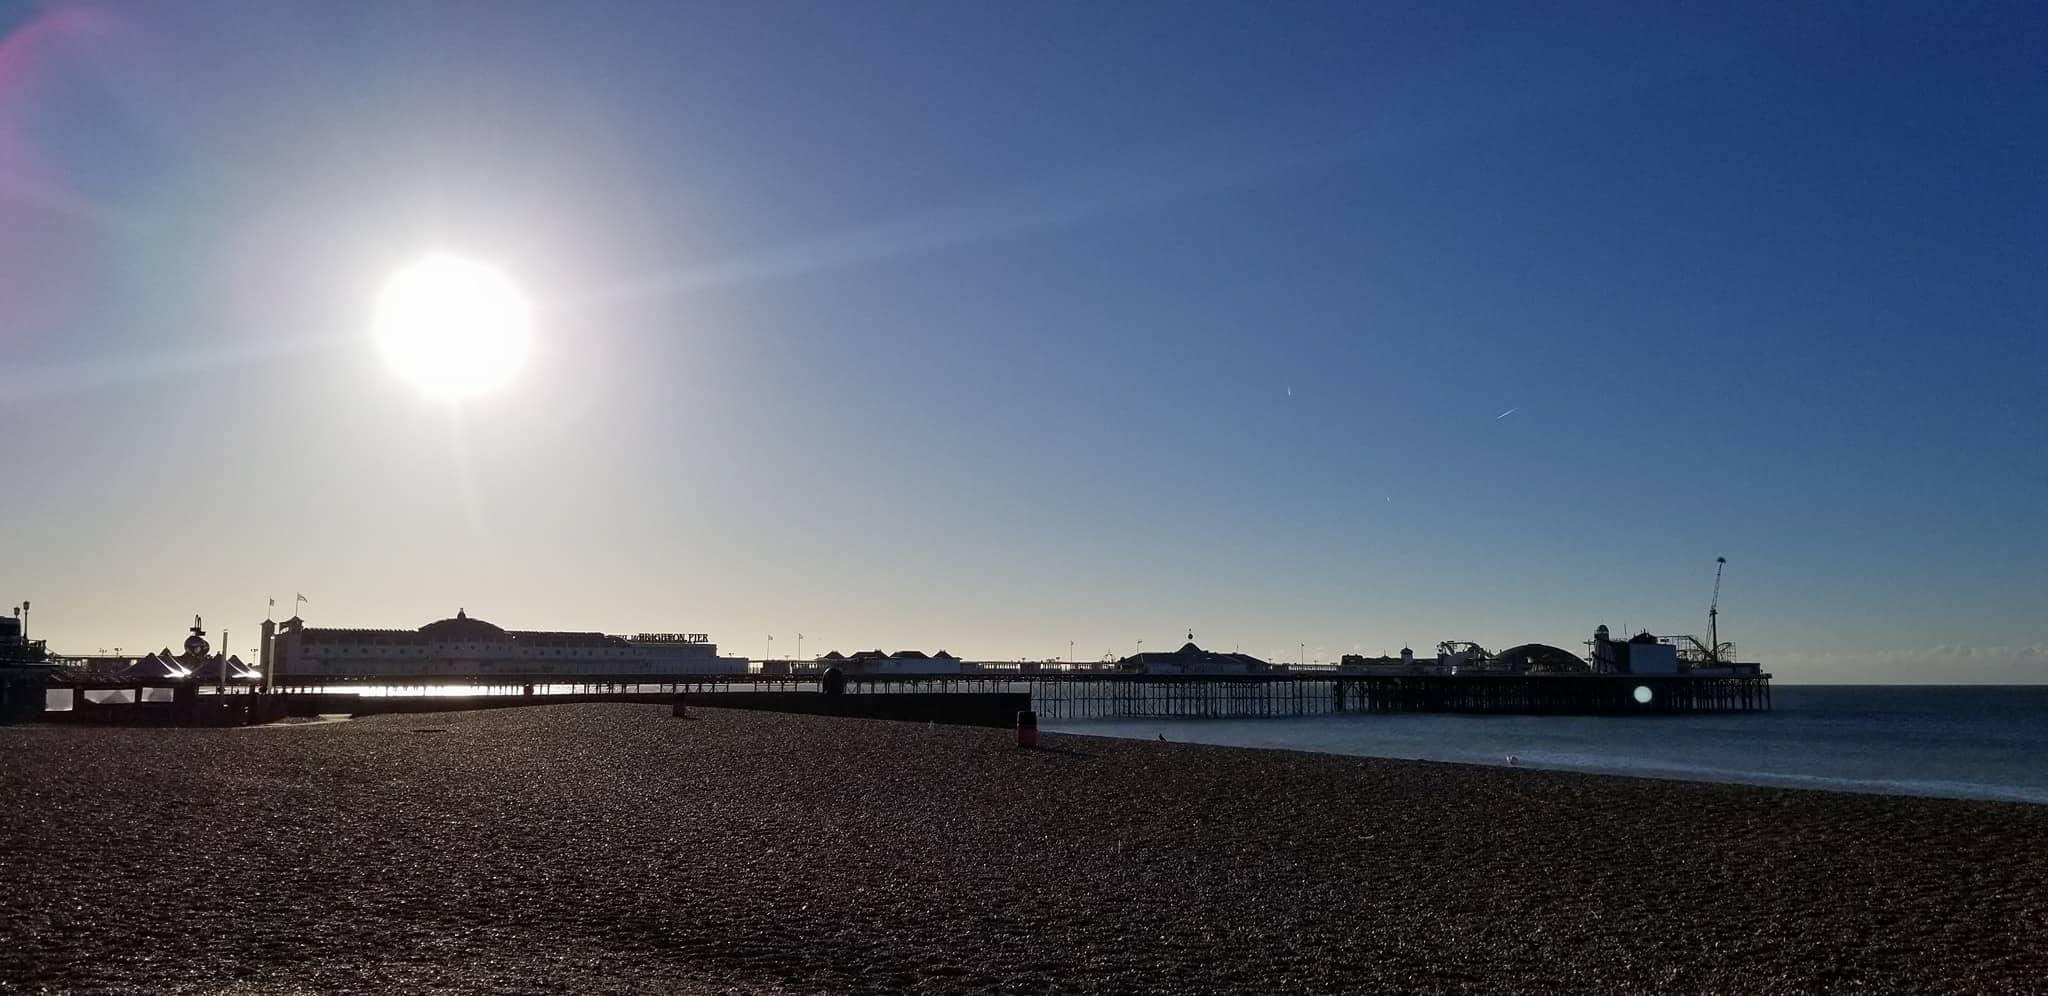 CAPAStudyAbroad_London_Fall2017_From Thaddeus Kaszuba - Brighton Pier from the Beach.jpg